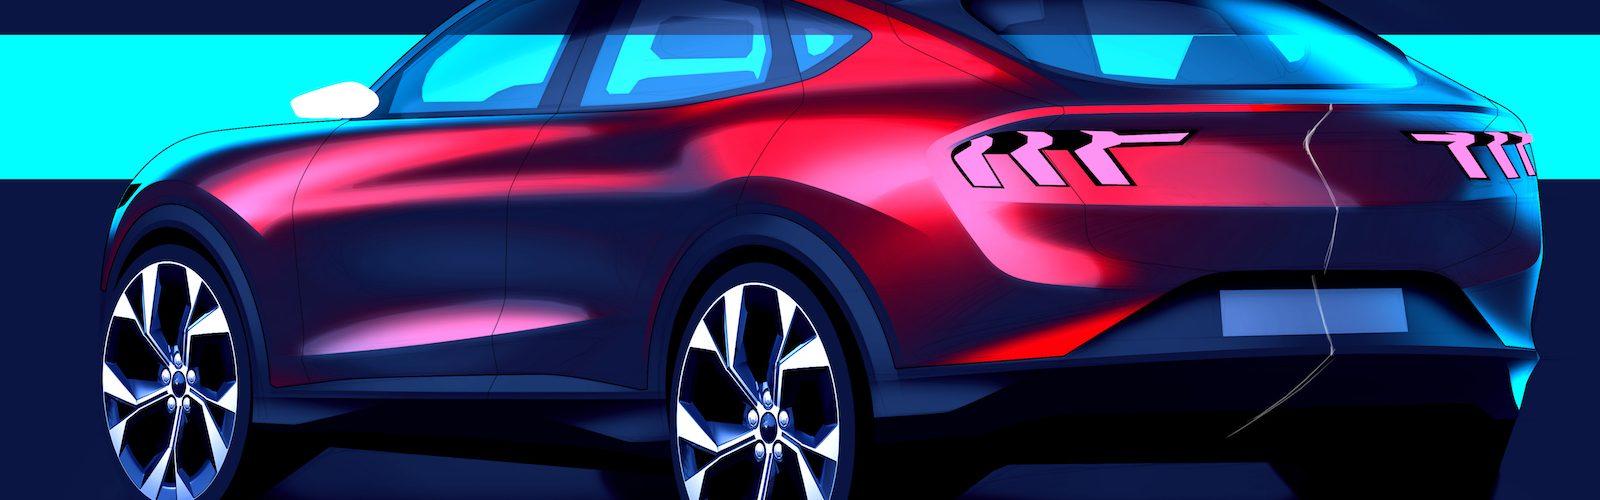 Mustang Mach-E Design Sketch